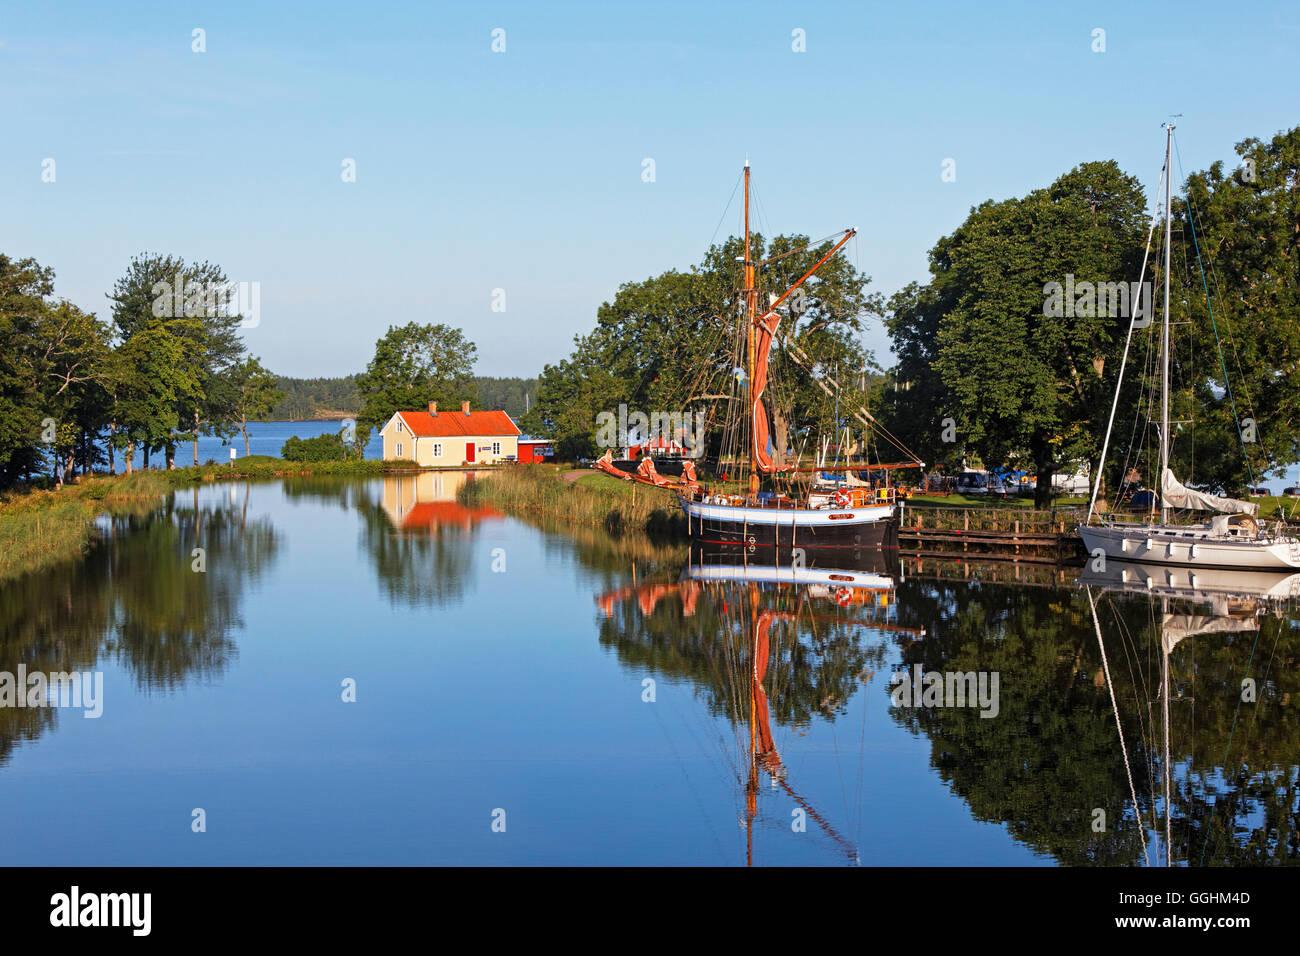 Sjoetorp at lake Vanern, Gota canal, Sweden - Stock Image